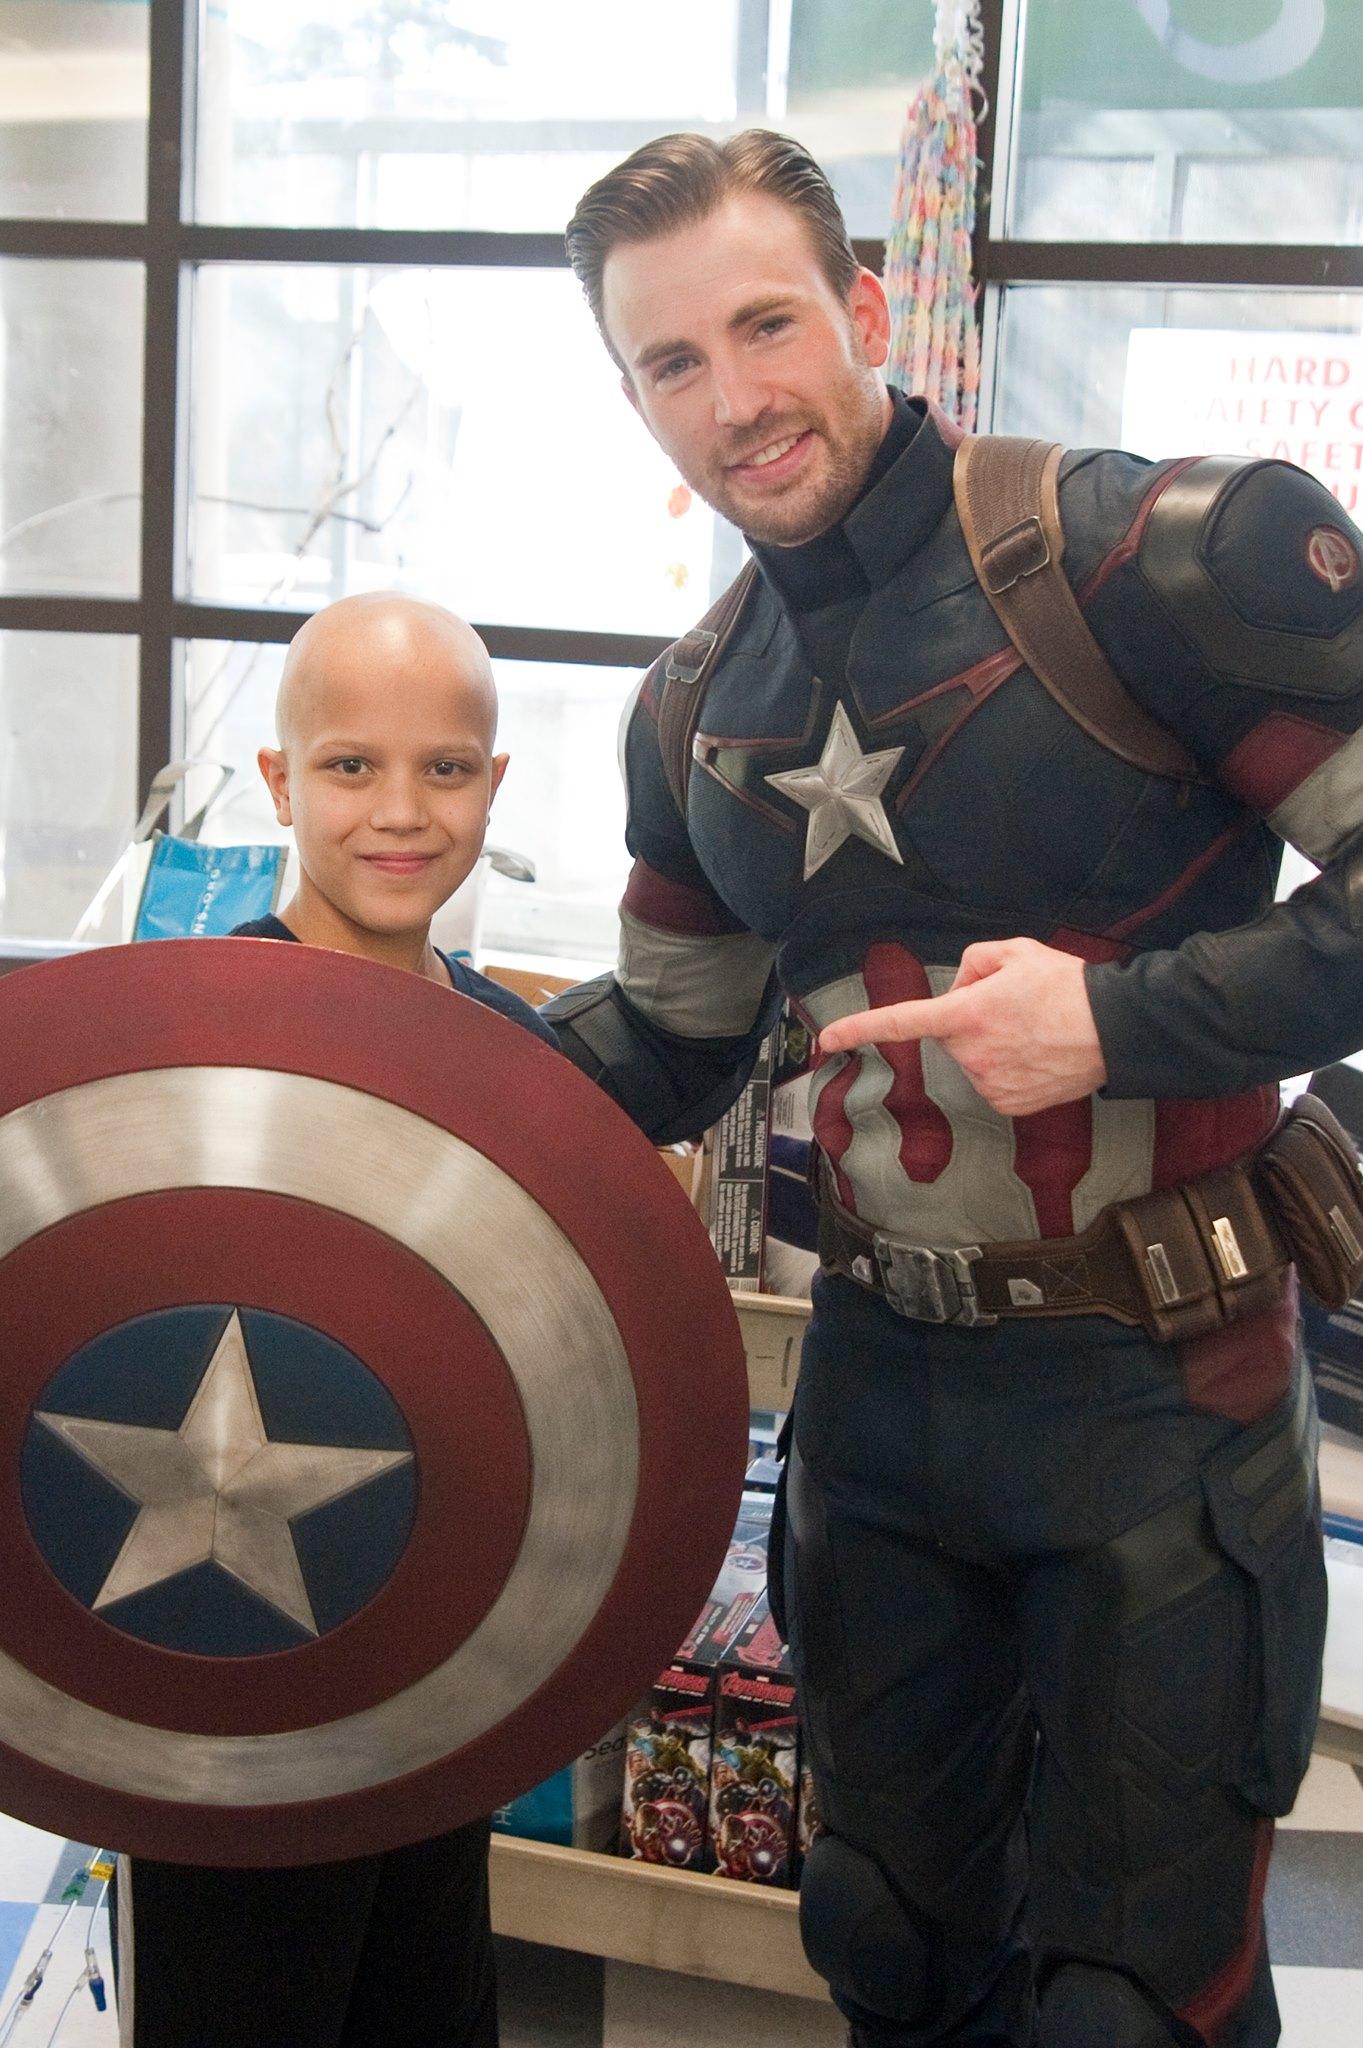 Captain-America-Star-Lord-Hopitaux-Enfants-6